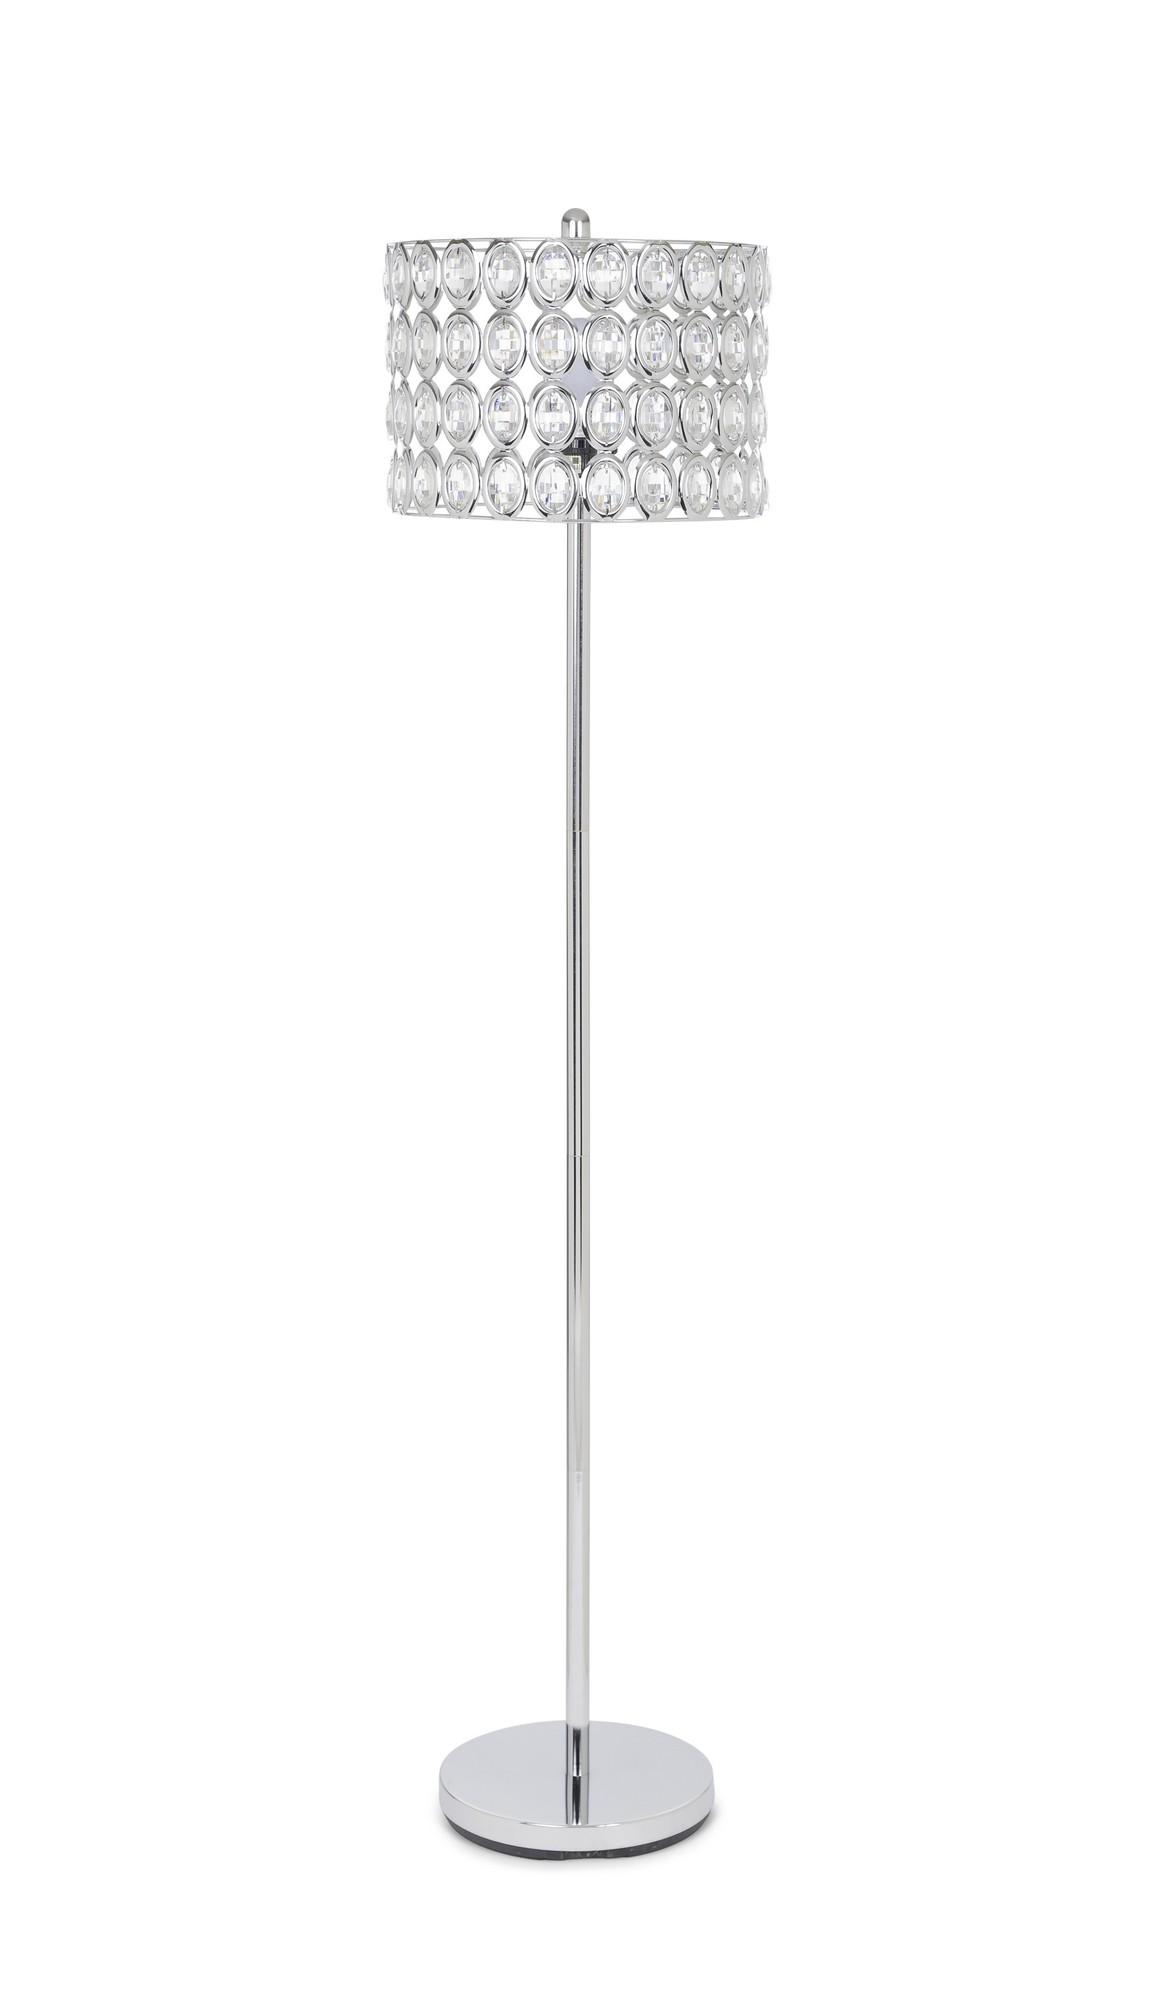 "62"" Round Shade Crystal Glam Floor Lamp"